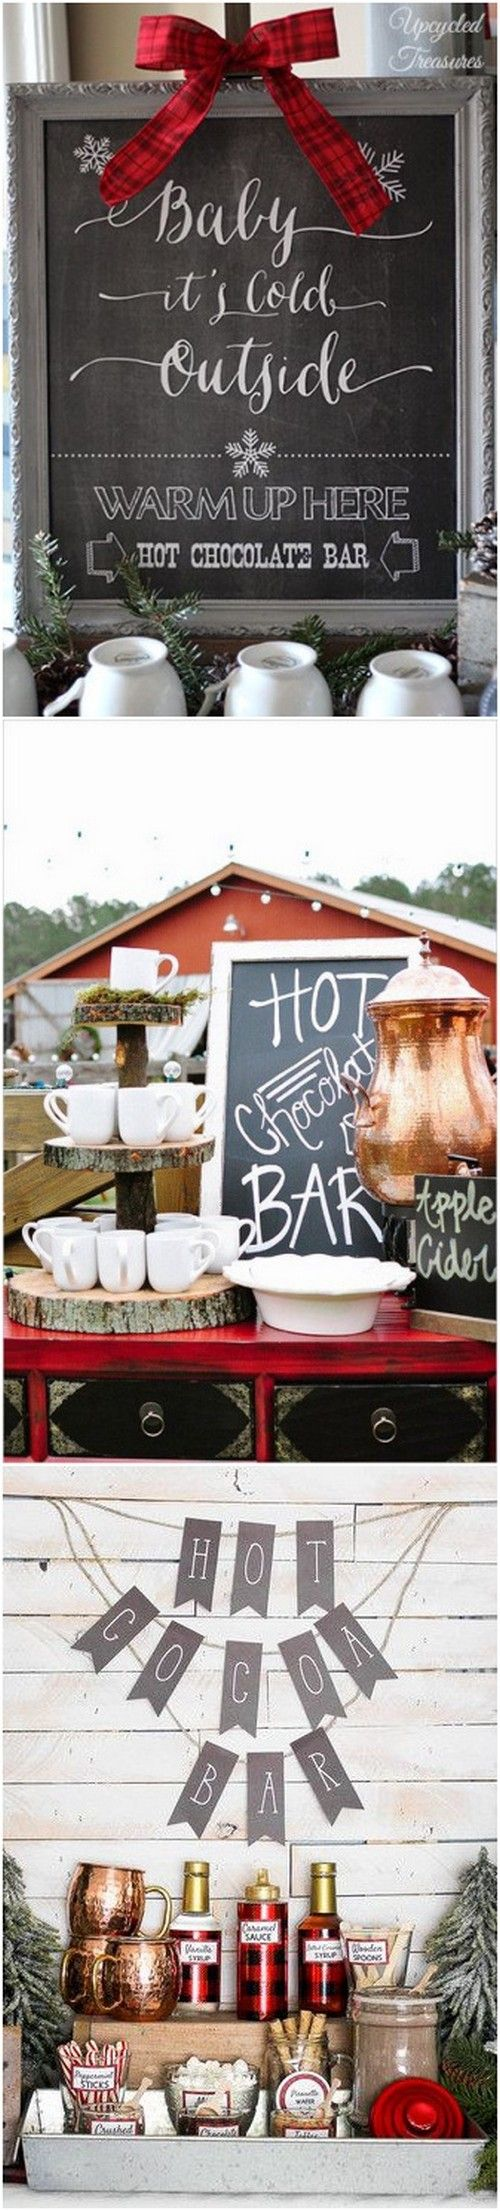 winter wedding bar ideas to warm guests